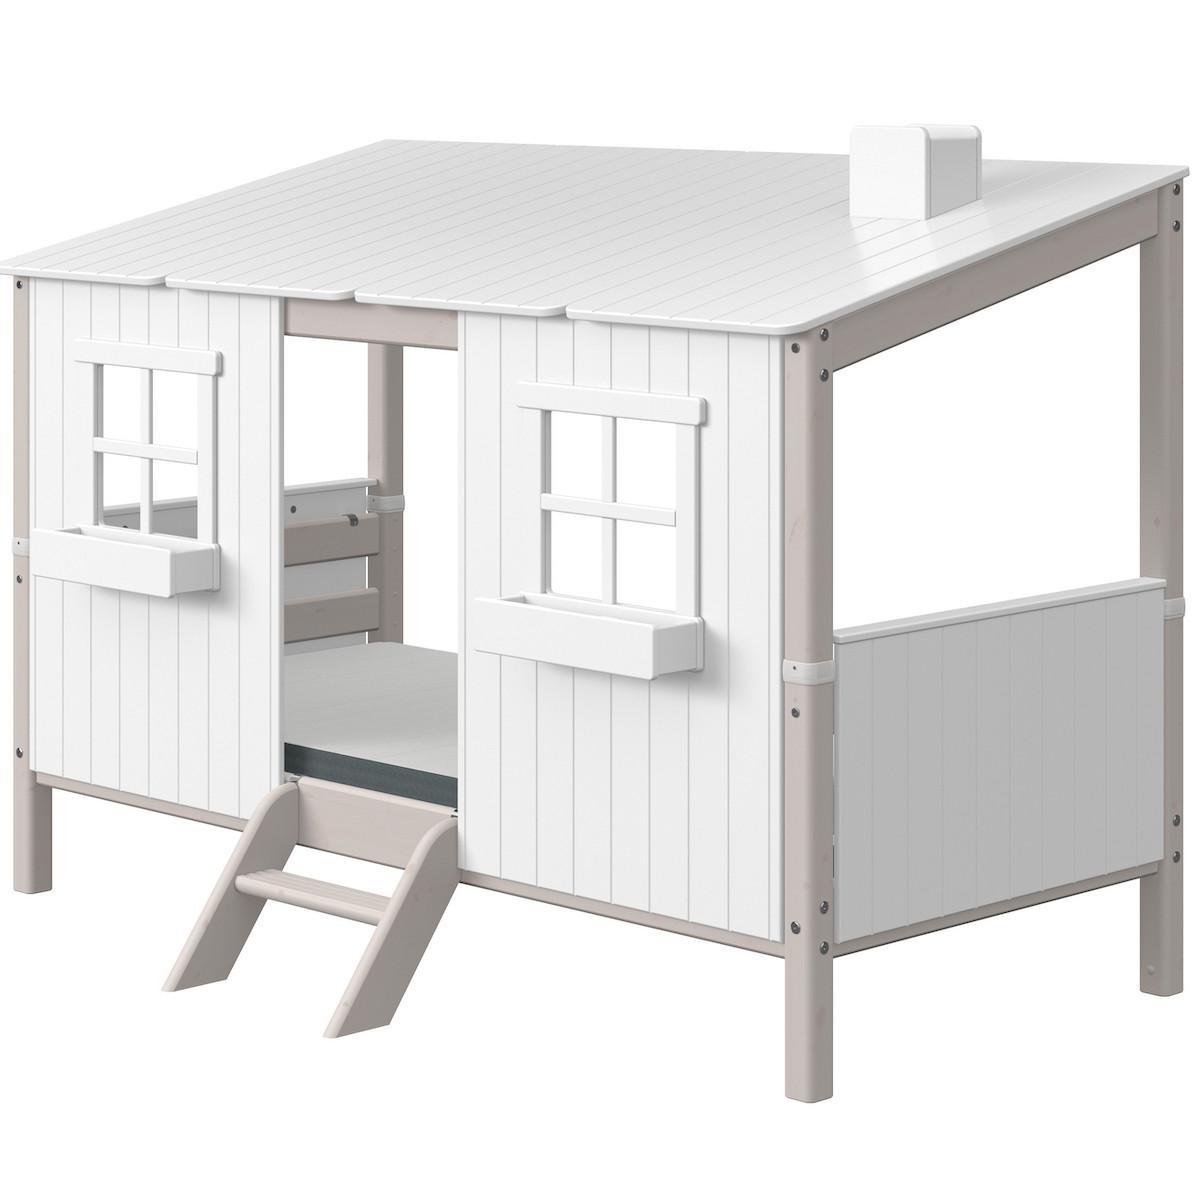 Lit bas évolutif cabane 90x200cm 1-2 PLAY HOUSE CLASSIC Flexa grey washed-blanc